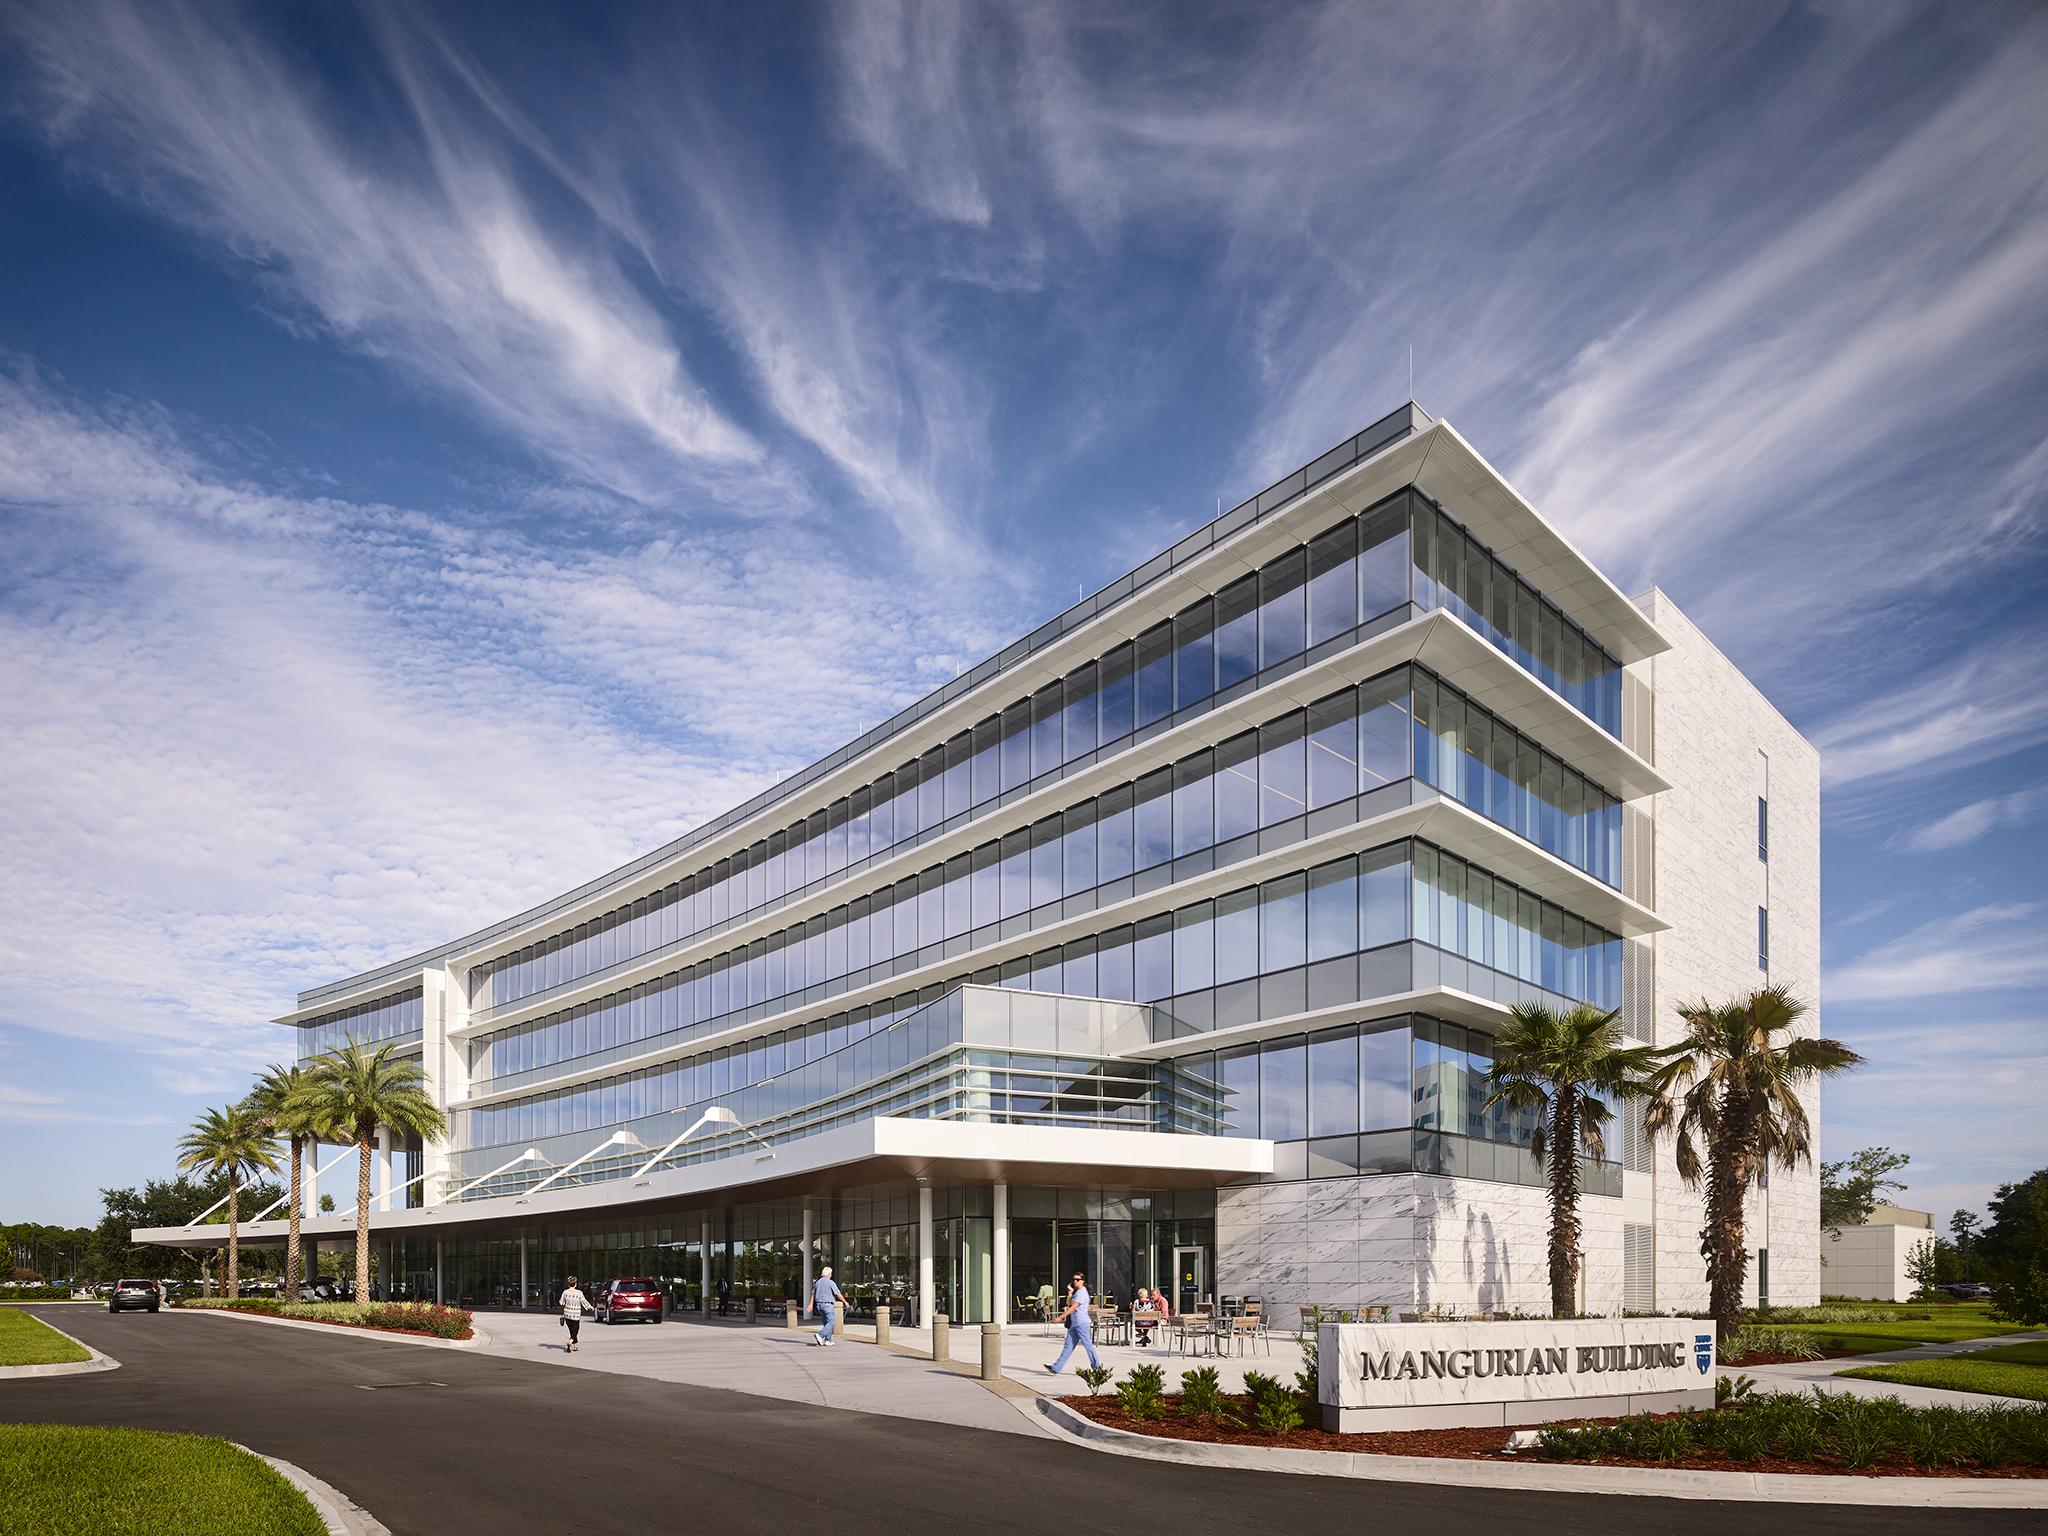 Mangurian Building - Mayo Clinic Jacksonville